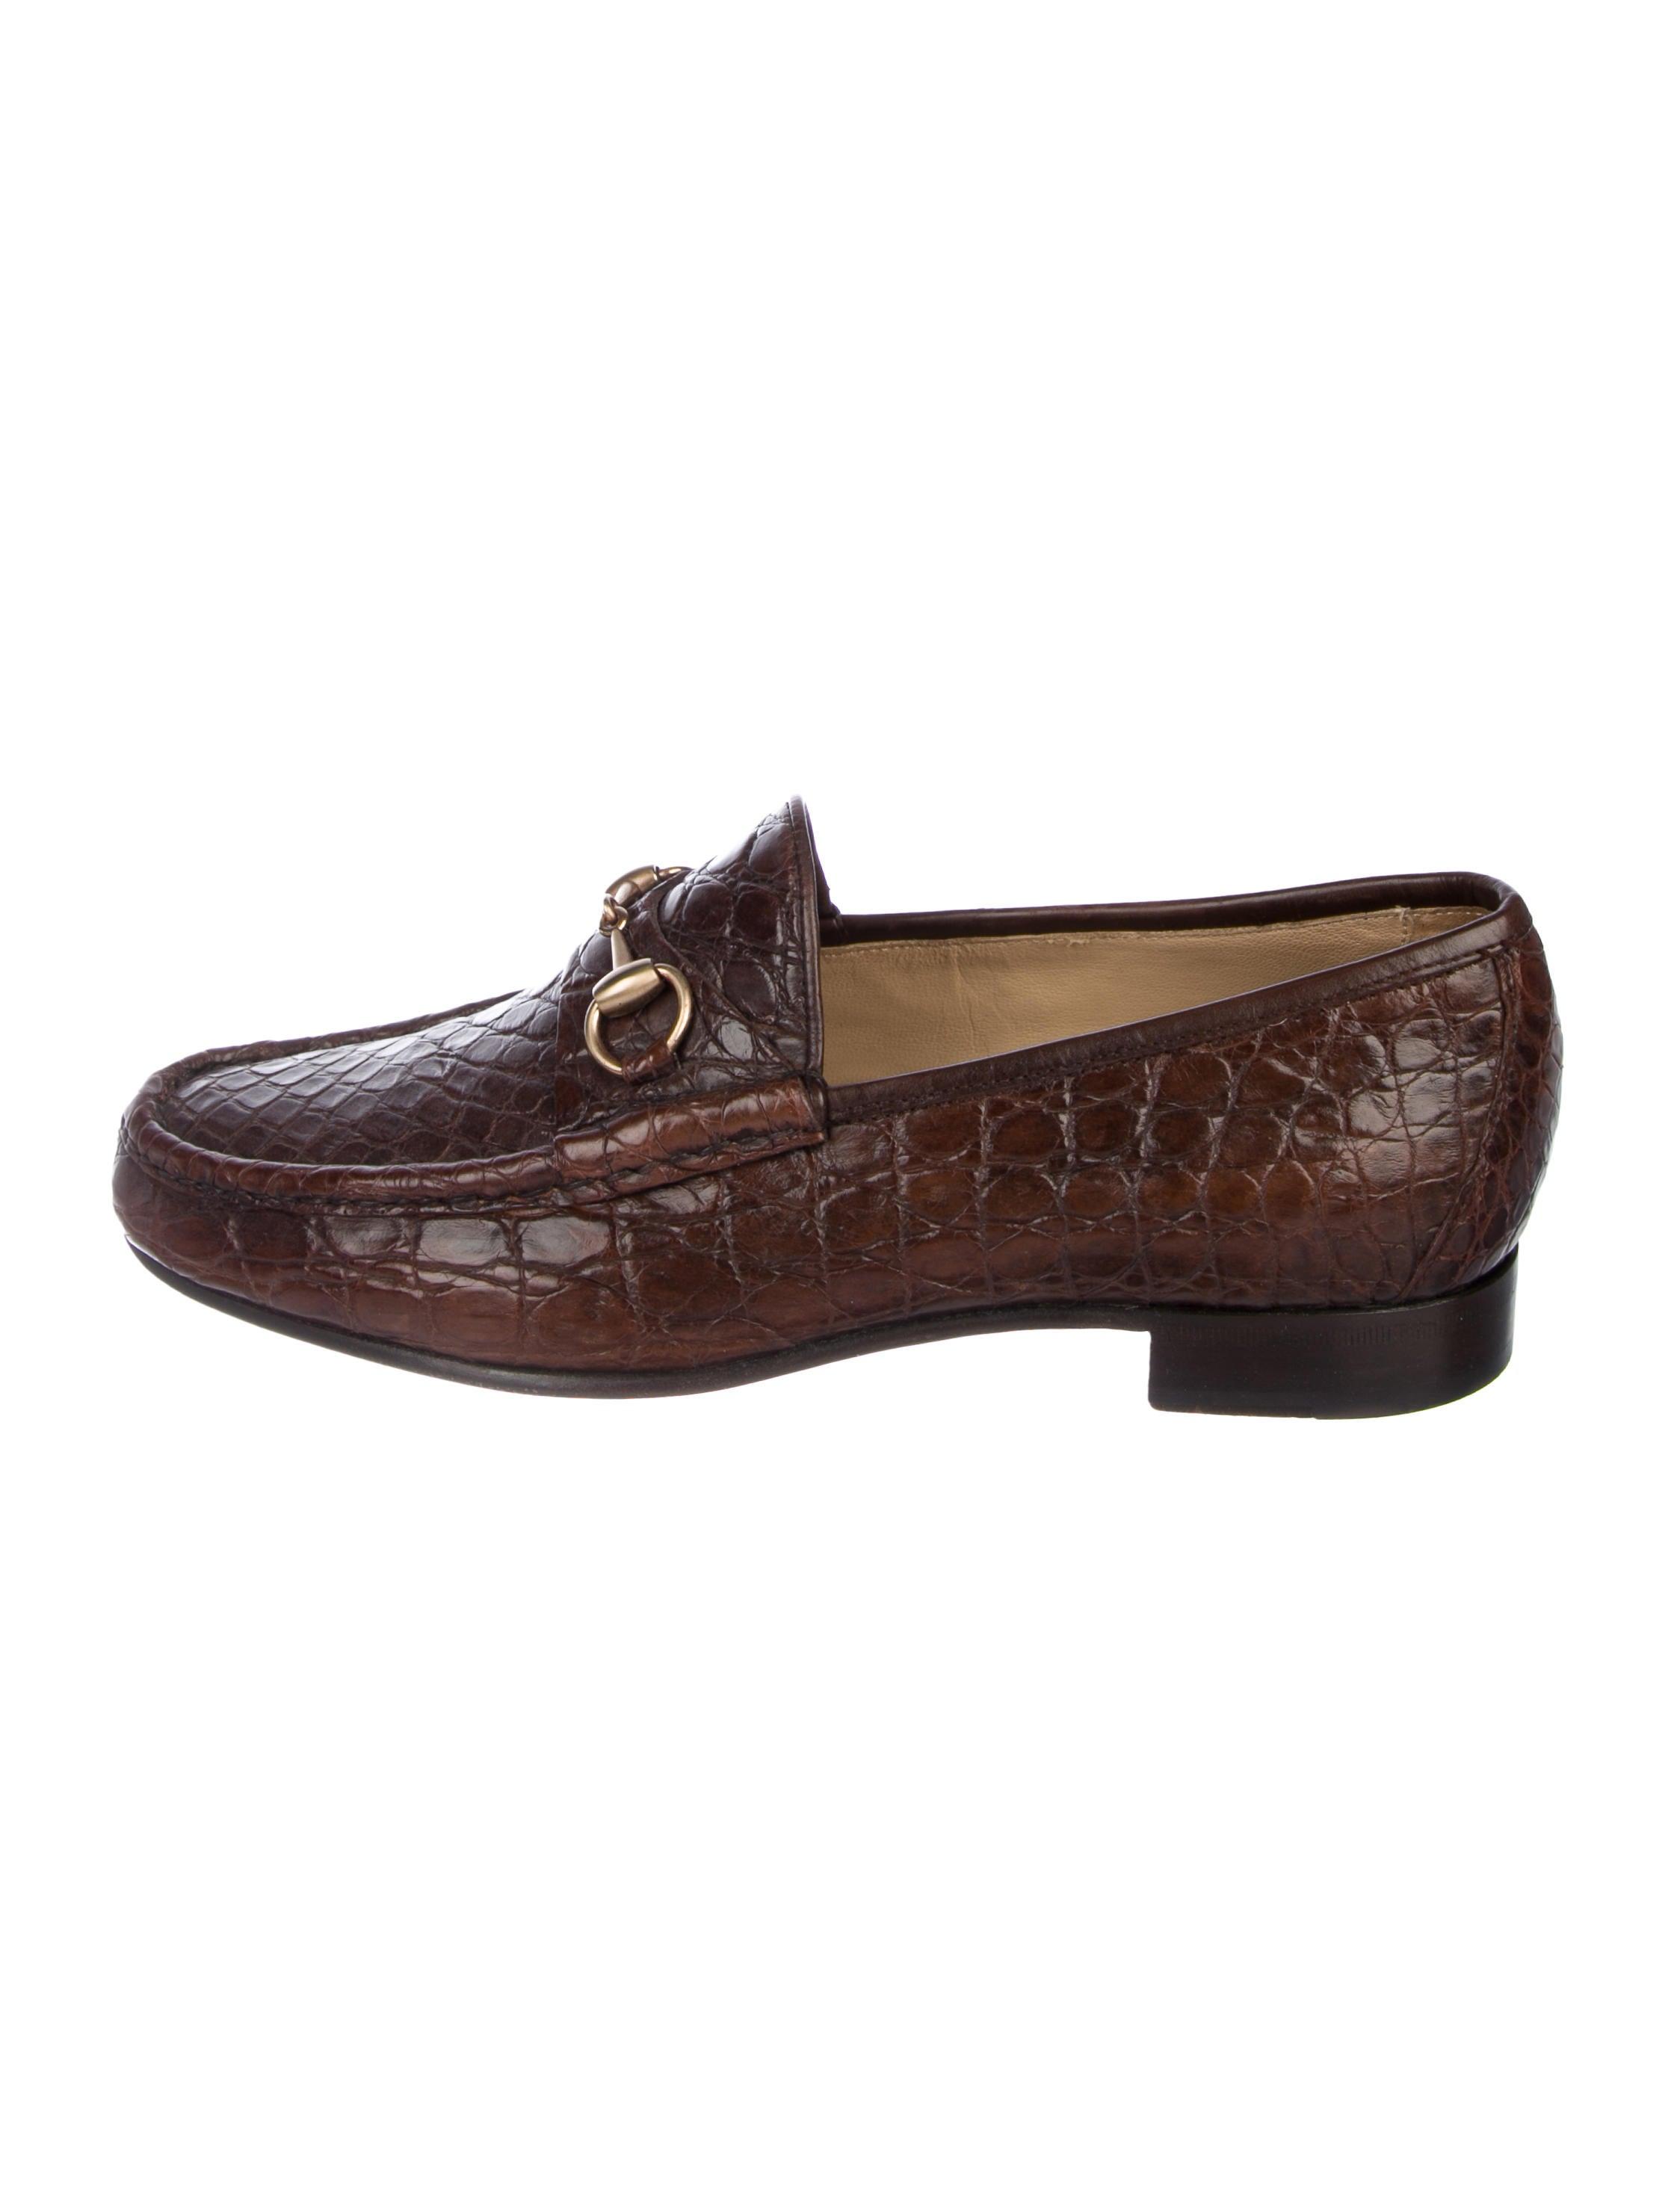 bec56d25045 Gucci Alligator Horsebit Loafers - Shoes - GUC259211